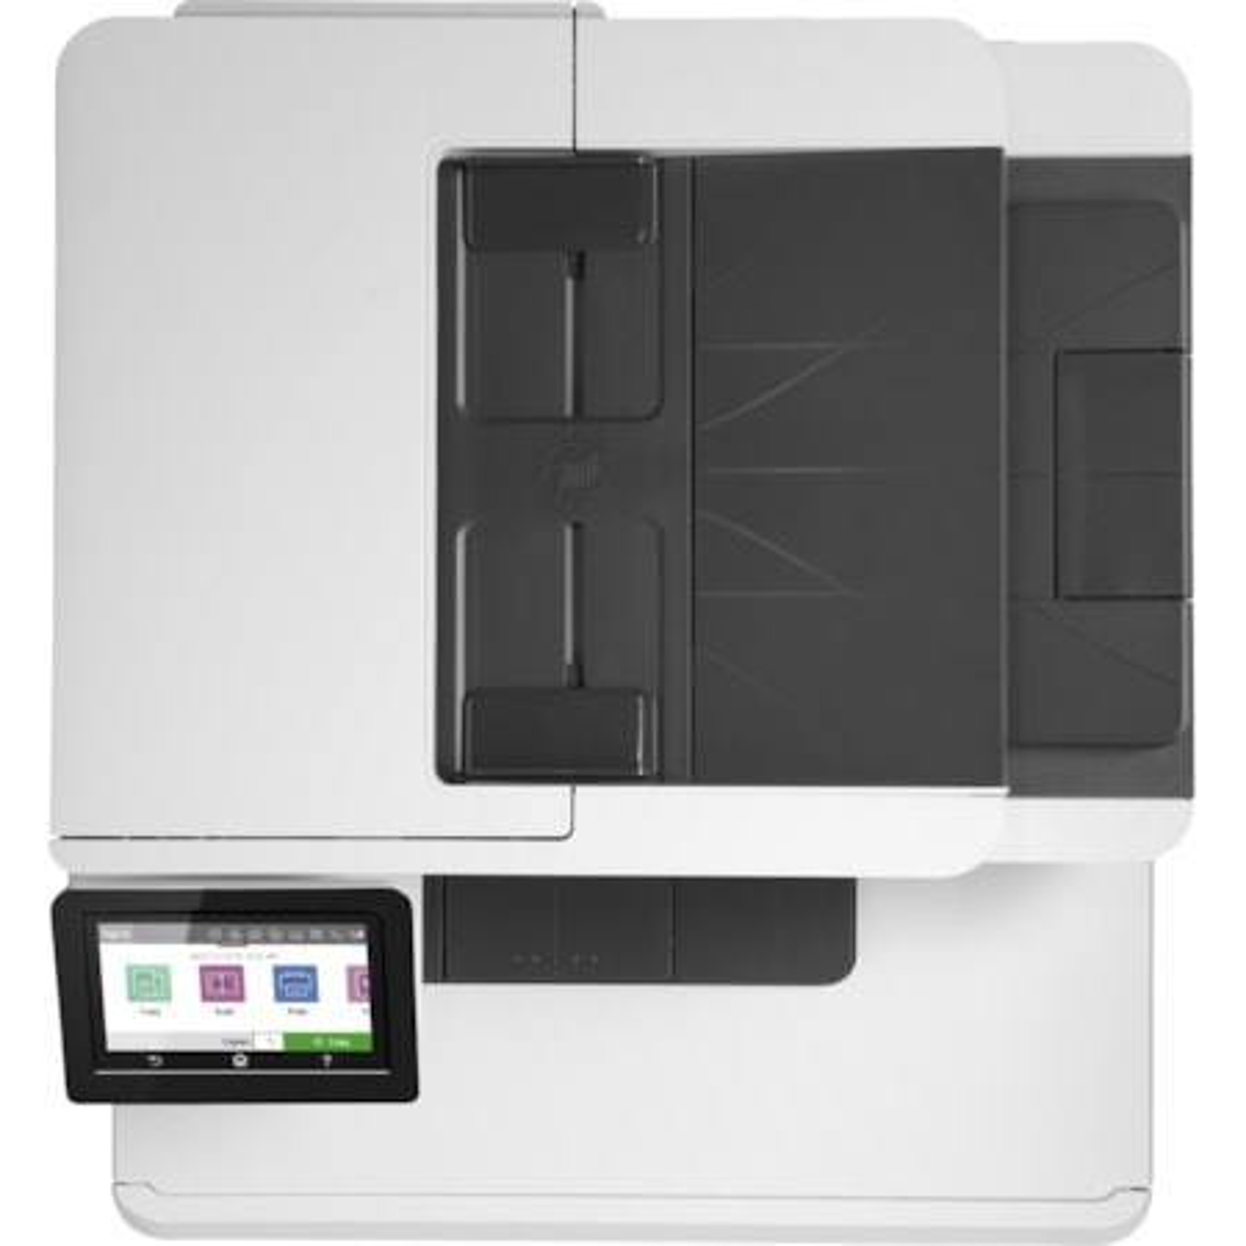 HP LaserJet Pro M479 M479fdw Laser Multifunction Printer - Colour